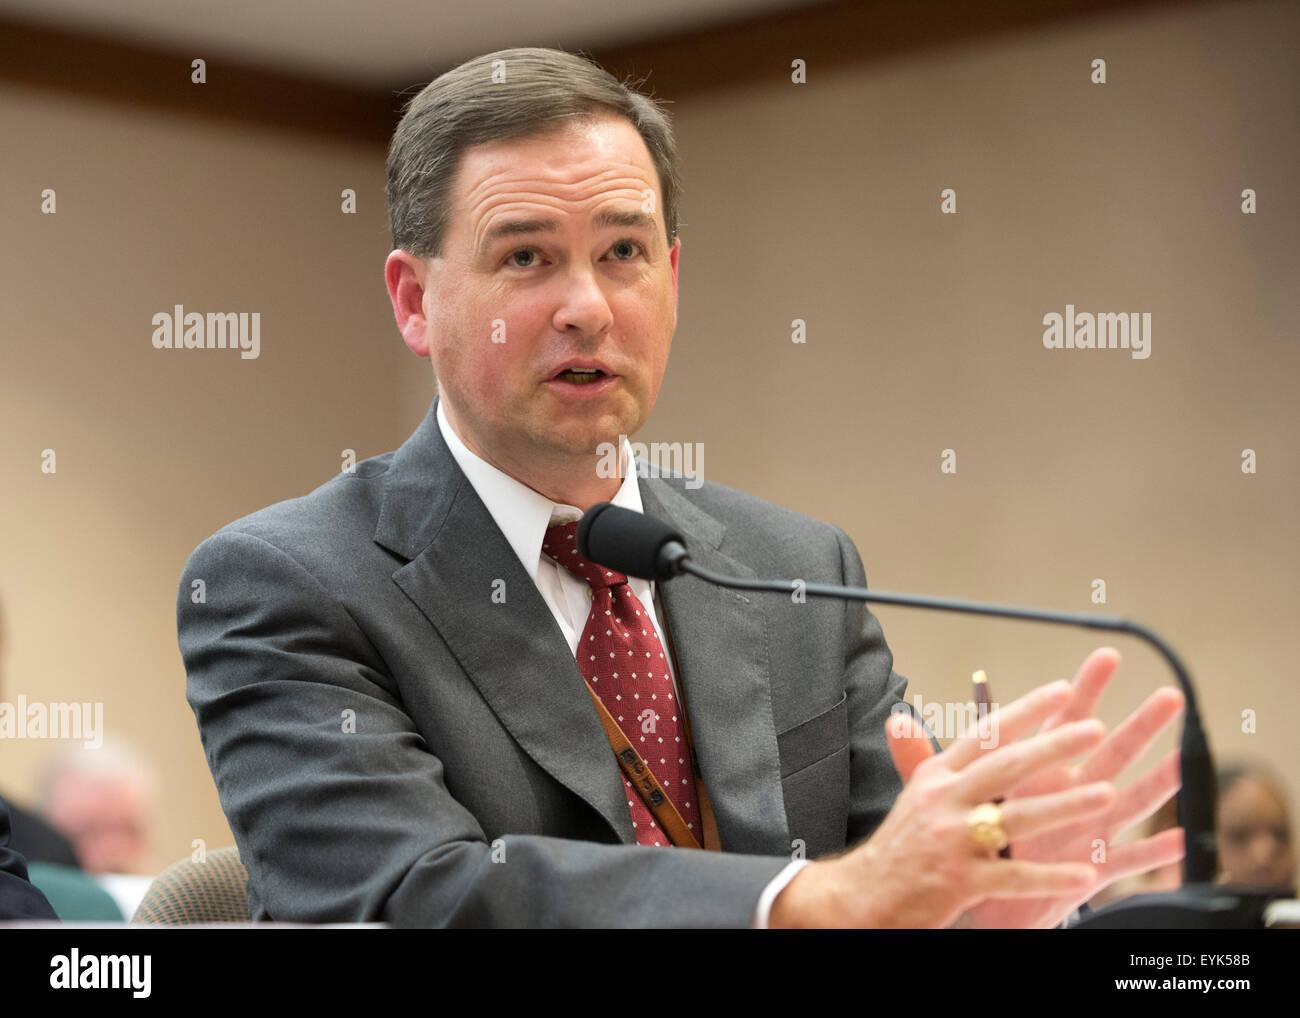 Austin, Texas USA July 30, 2015:Brandon Wood of the Texas Commission